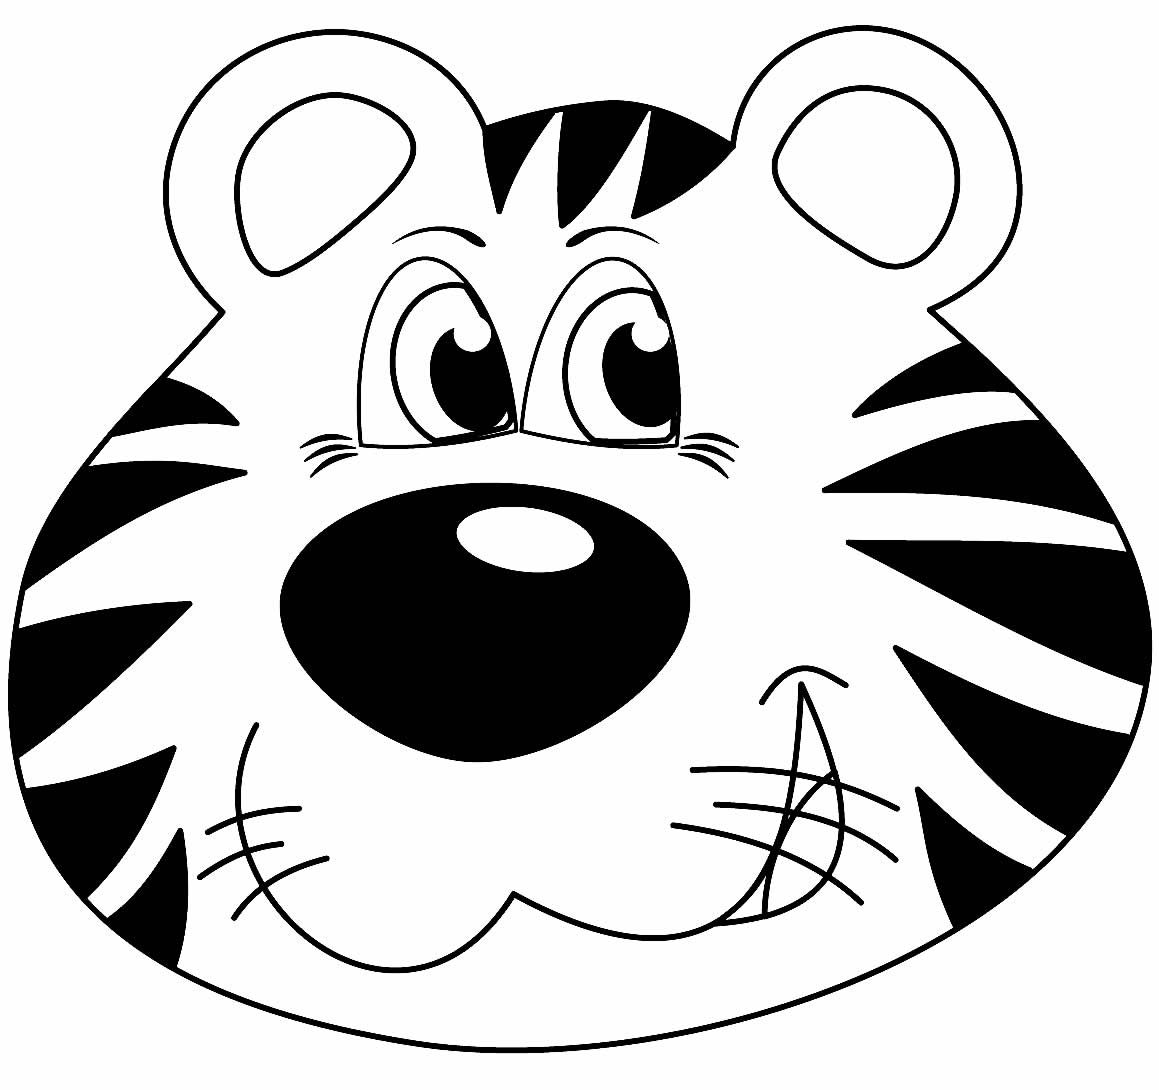 Desenho de Tigre para colorir